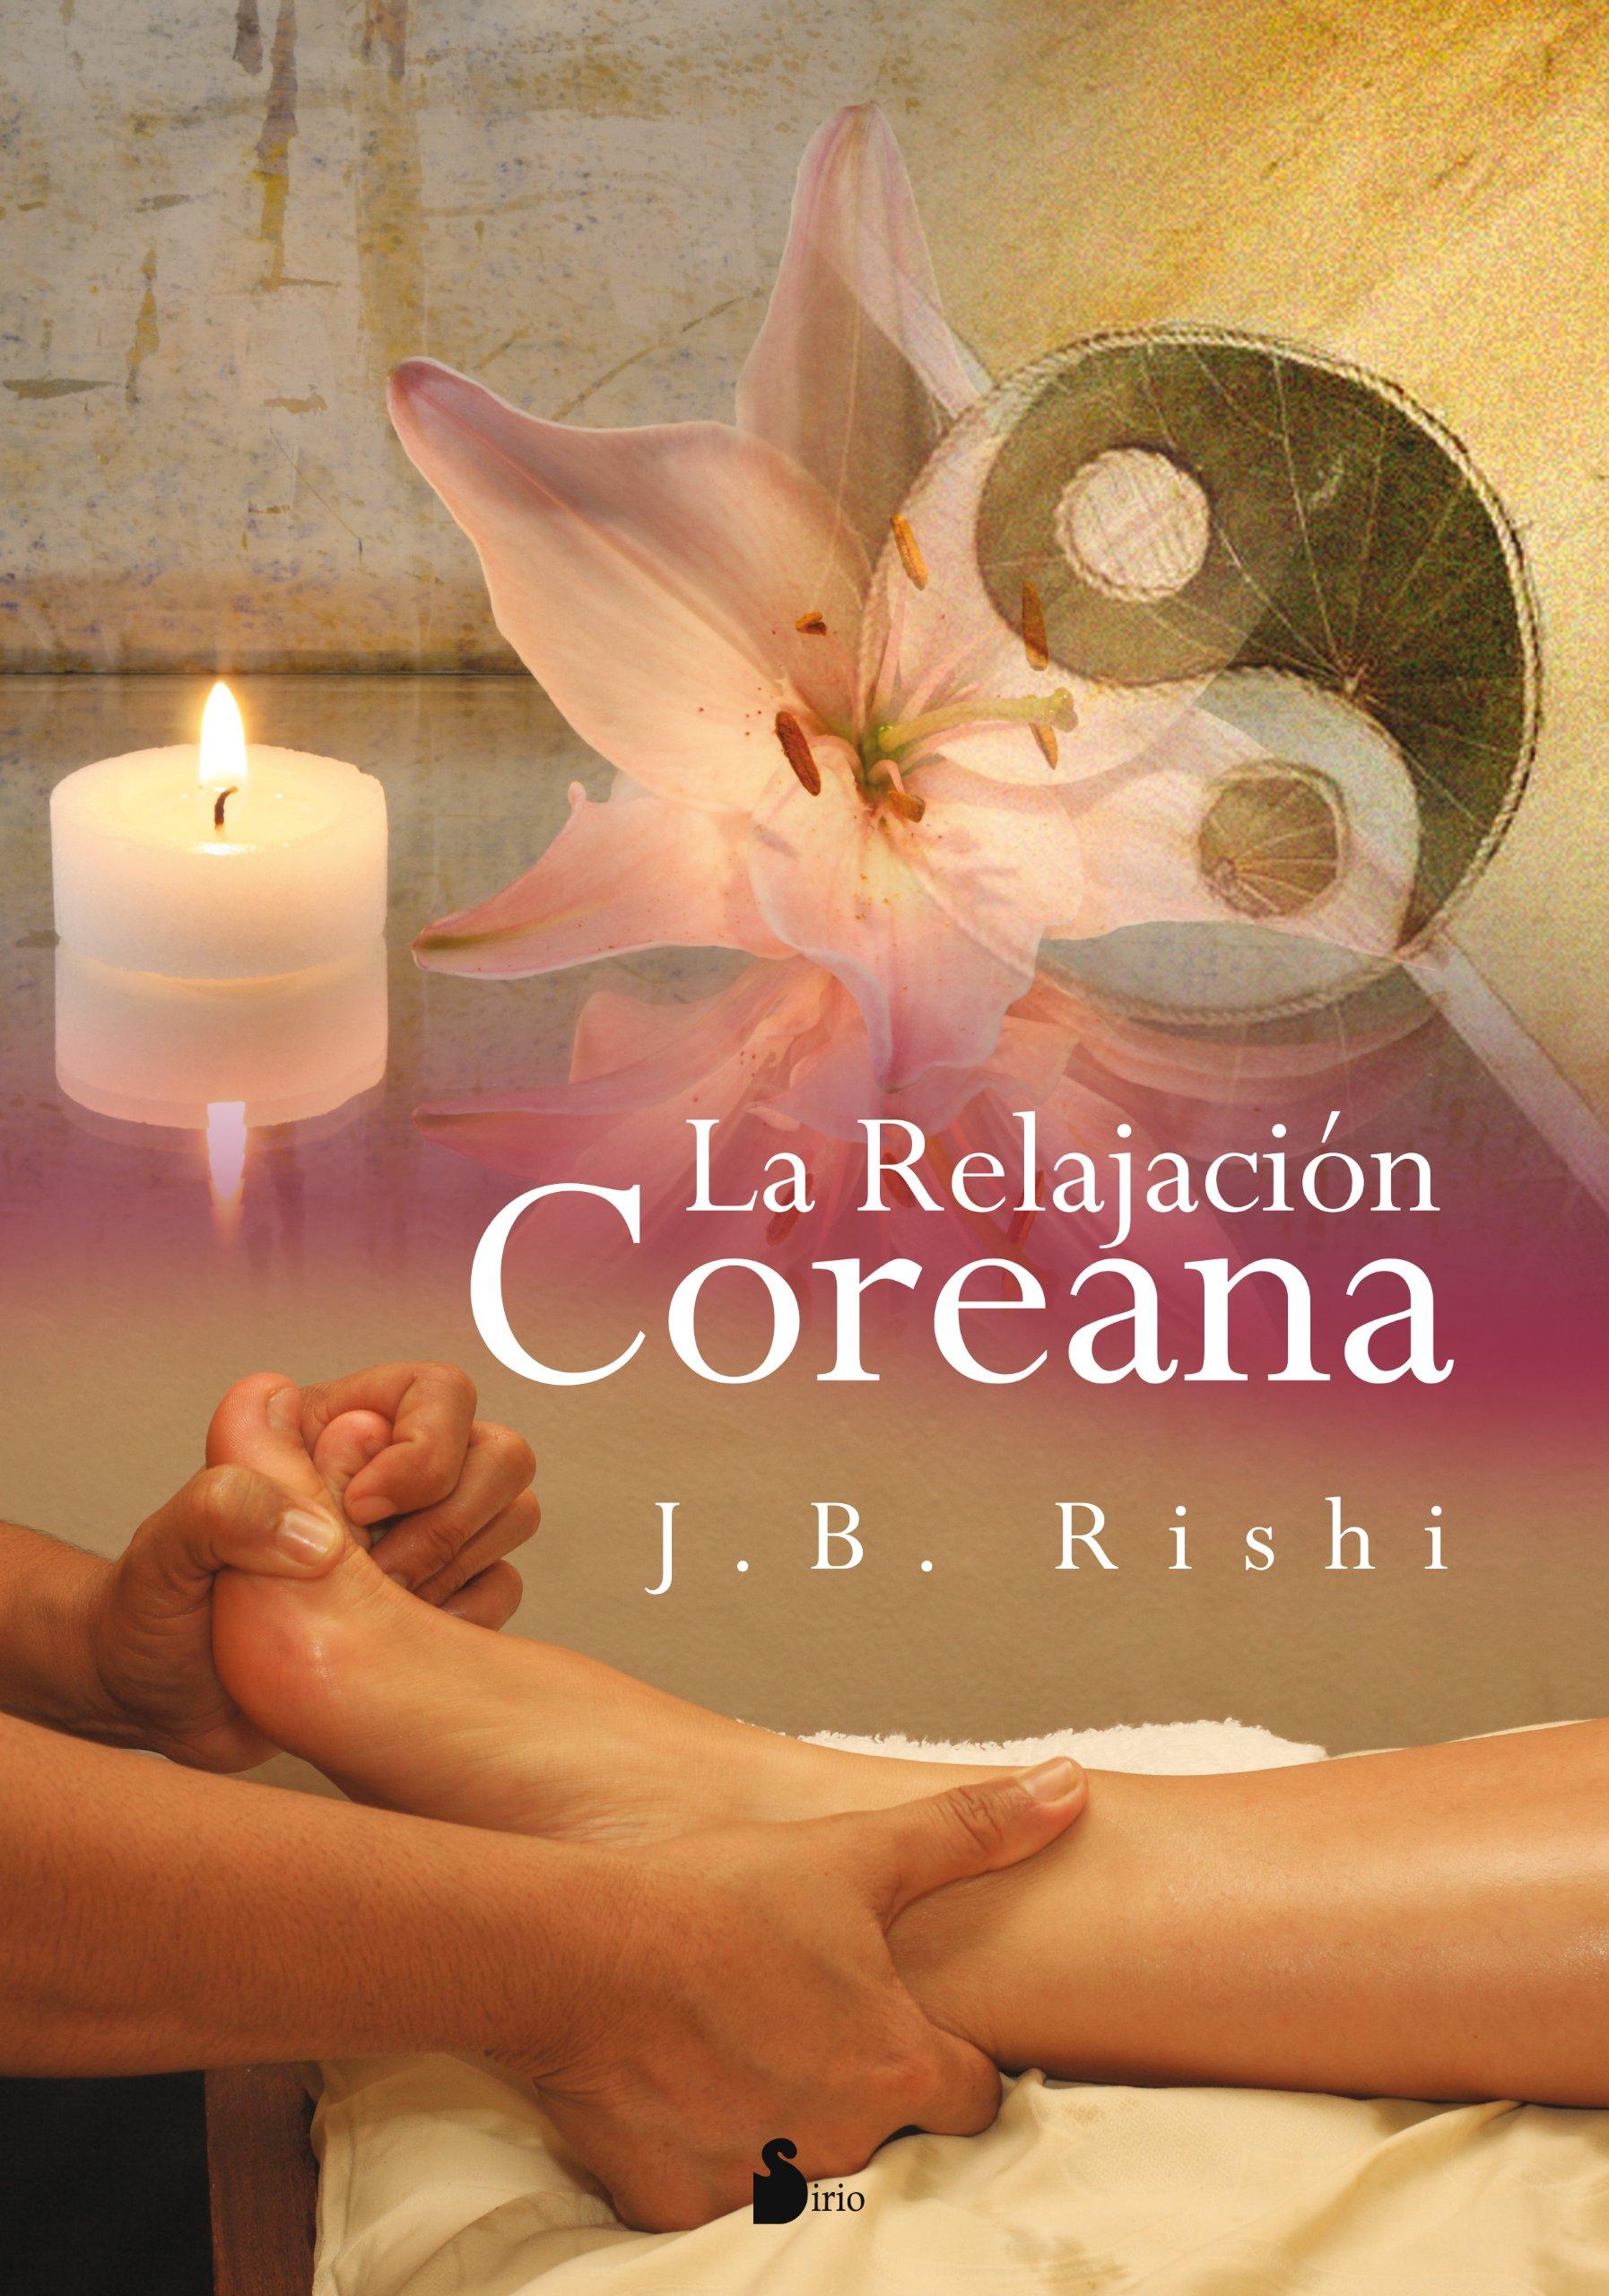 La relajacion coreana (Spanish Edition) (Spanish) Paperback – September 15, 2011